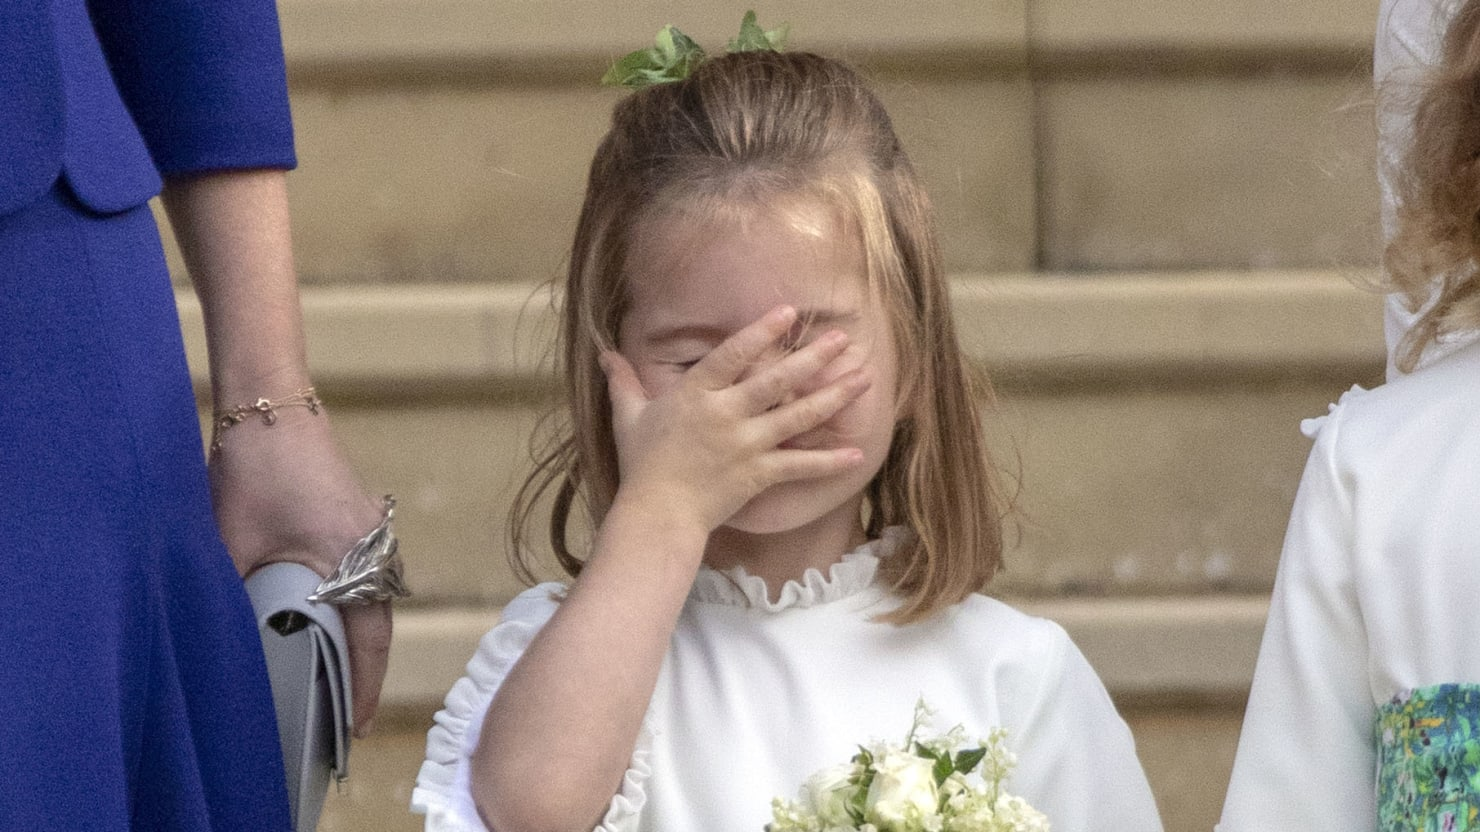 Princess Charlotte Dashes Into London Pub With Mum Kate Middleton For Emergency Bathroom Break